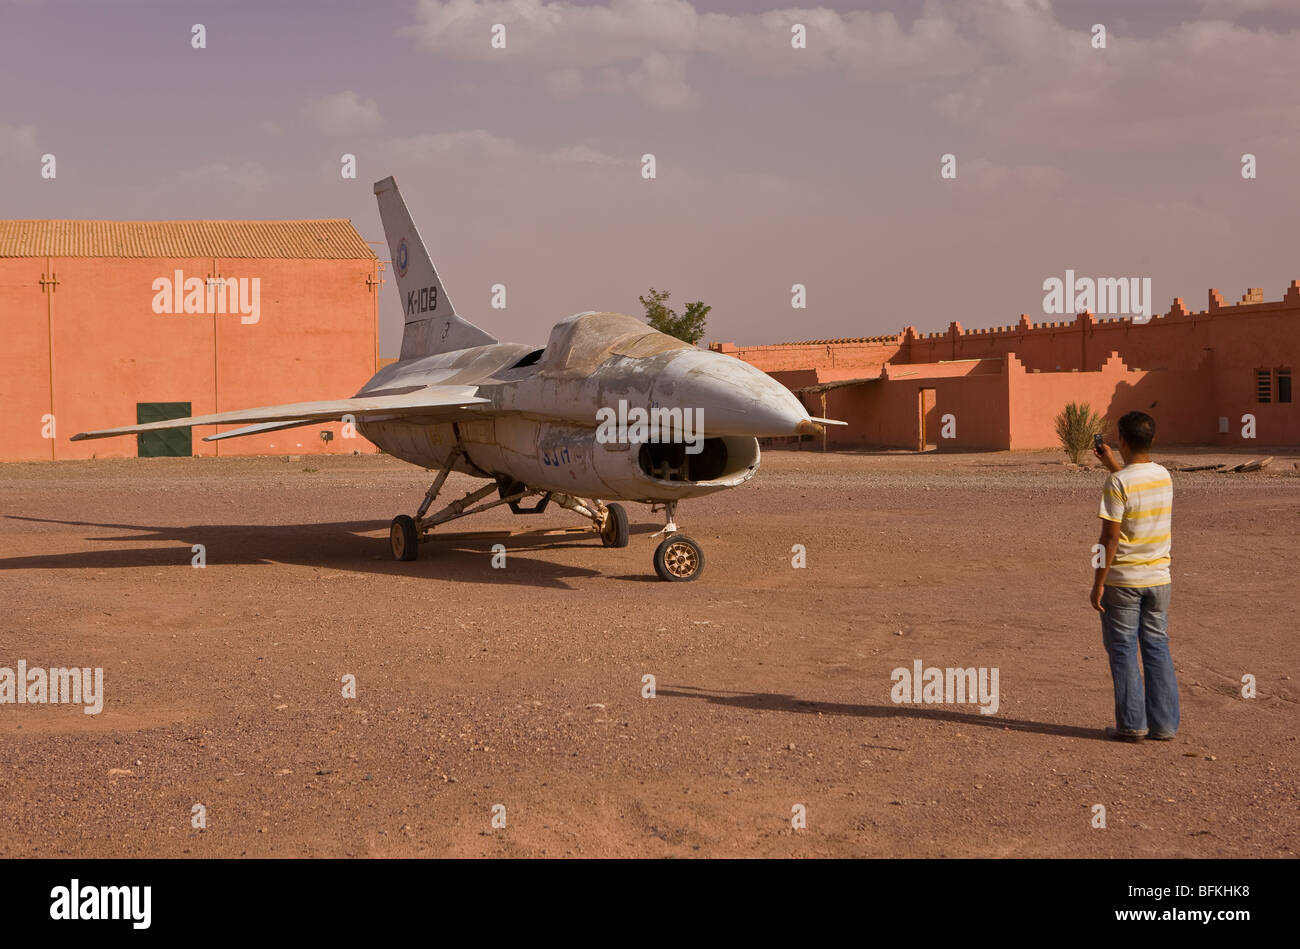 OUARZAZATE, MOROCCO - Tourist takes photo of jet fighter prop on movie set at Atlas Corporation Studios. - Stock Image